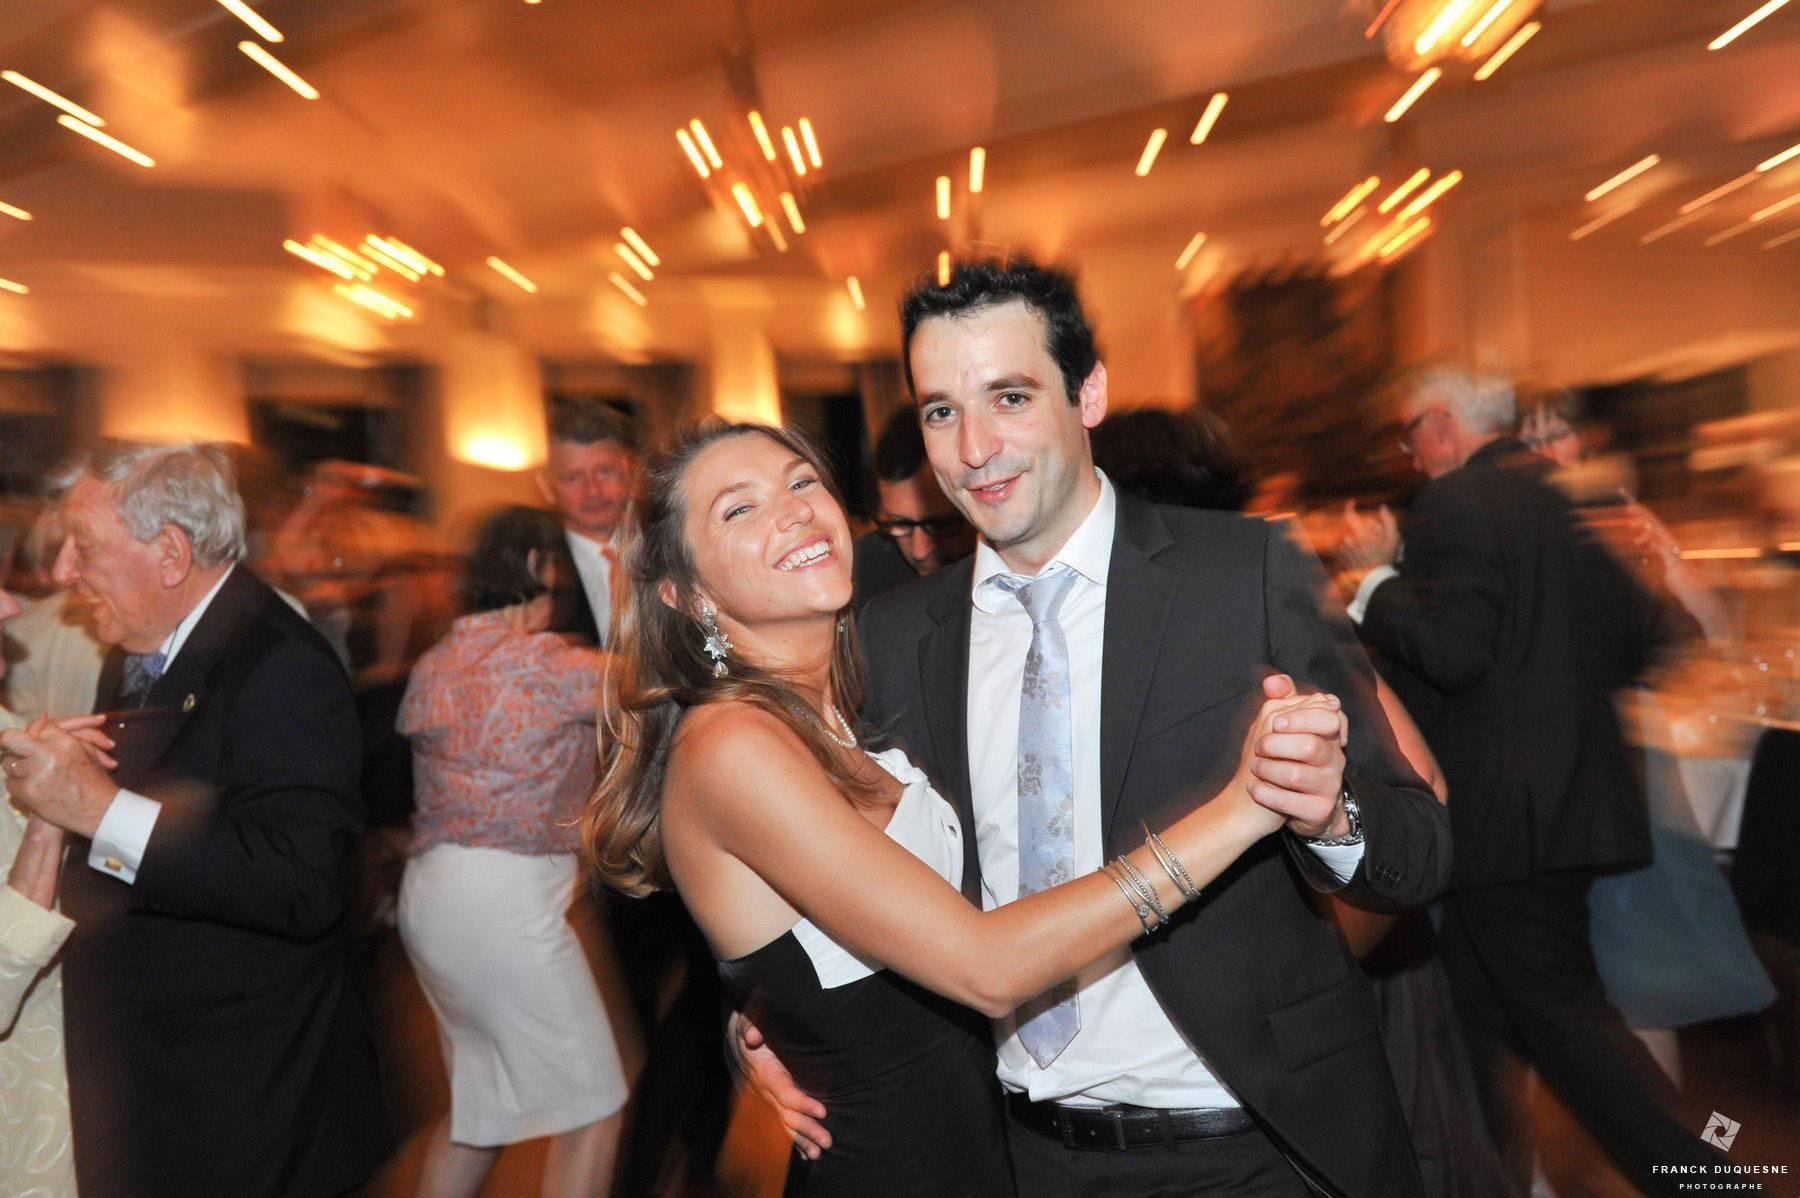 Photo de danse en soirée de mariage